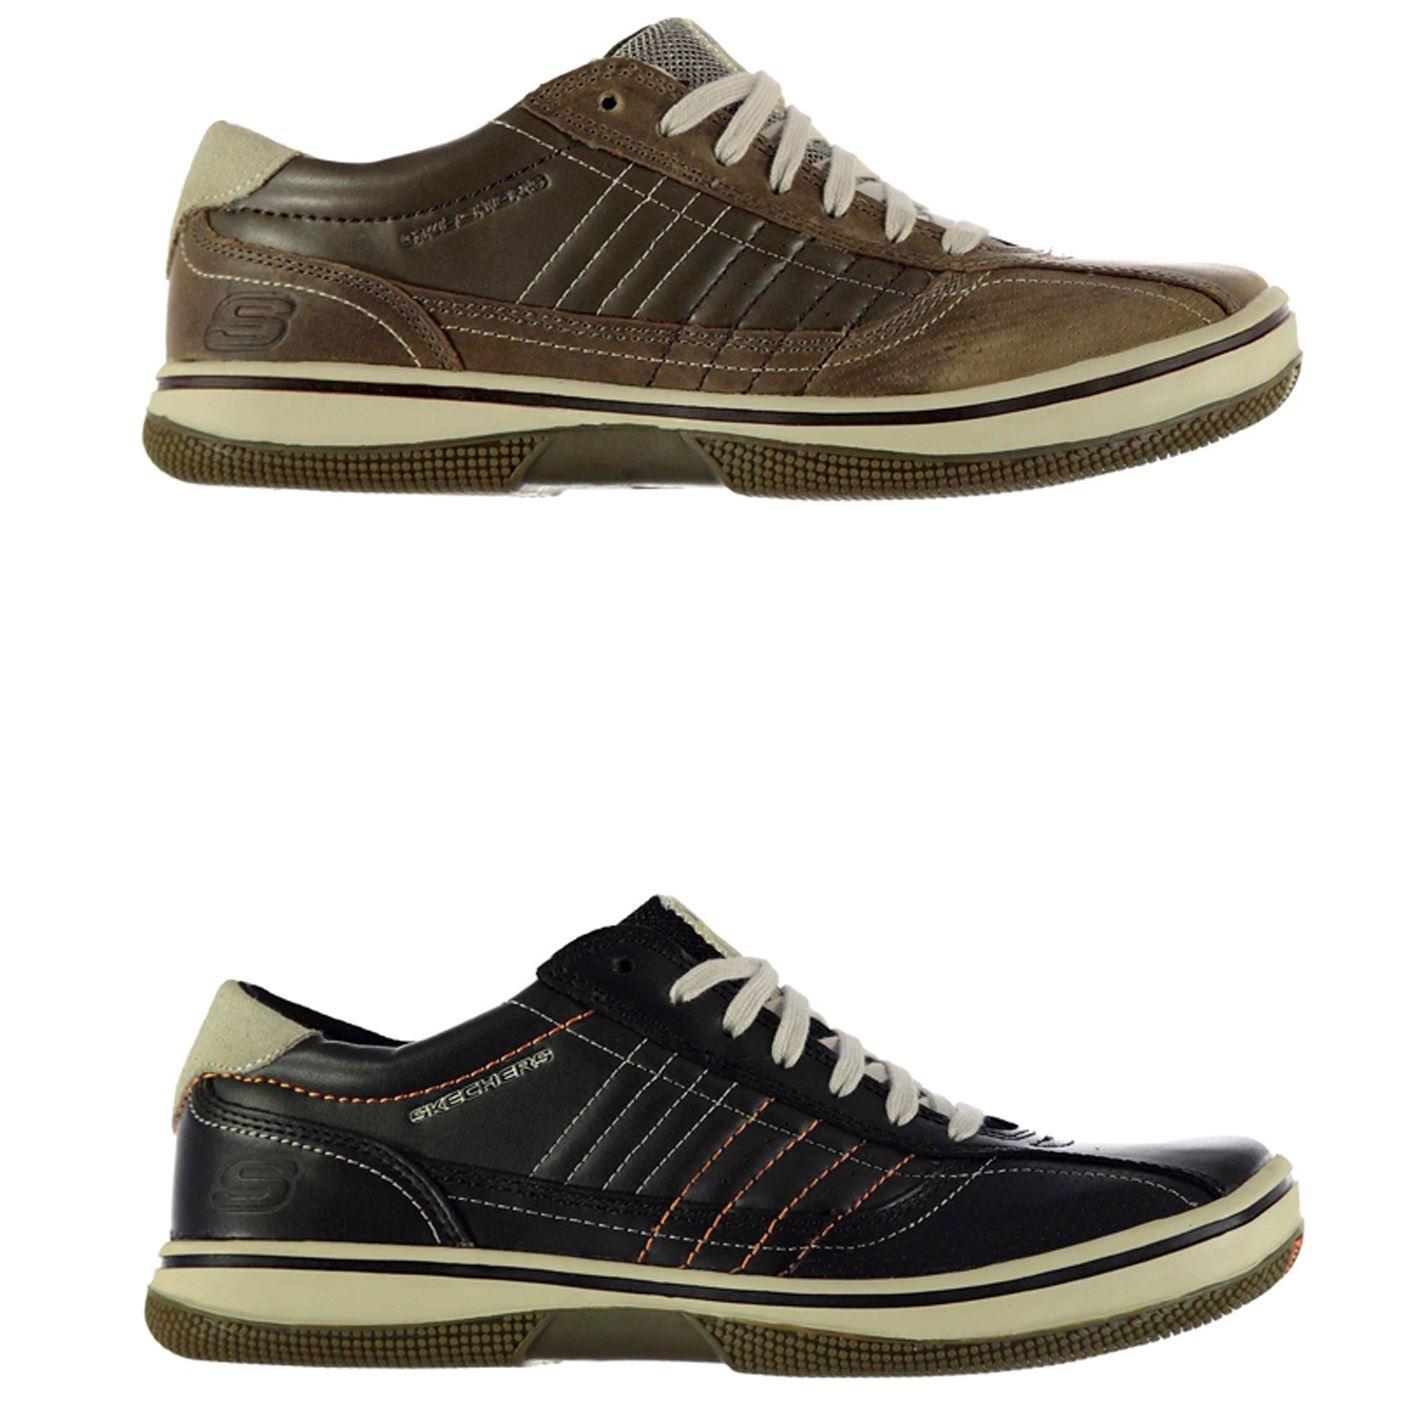 timeless design 25284 eeaba ... Skechers Piers Sport Trainers Mens Athleisure Footwear Shoes Sneakers  ...